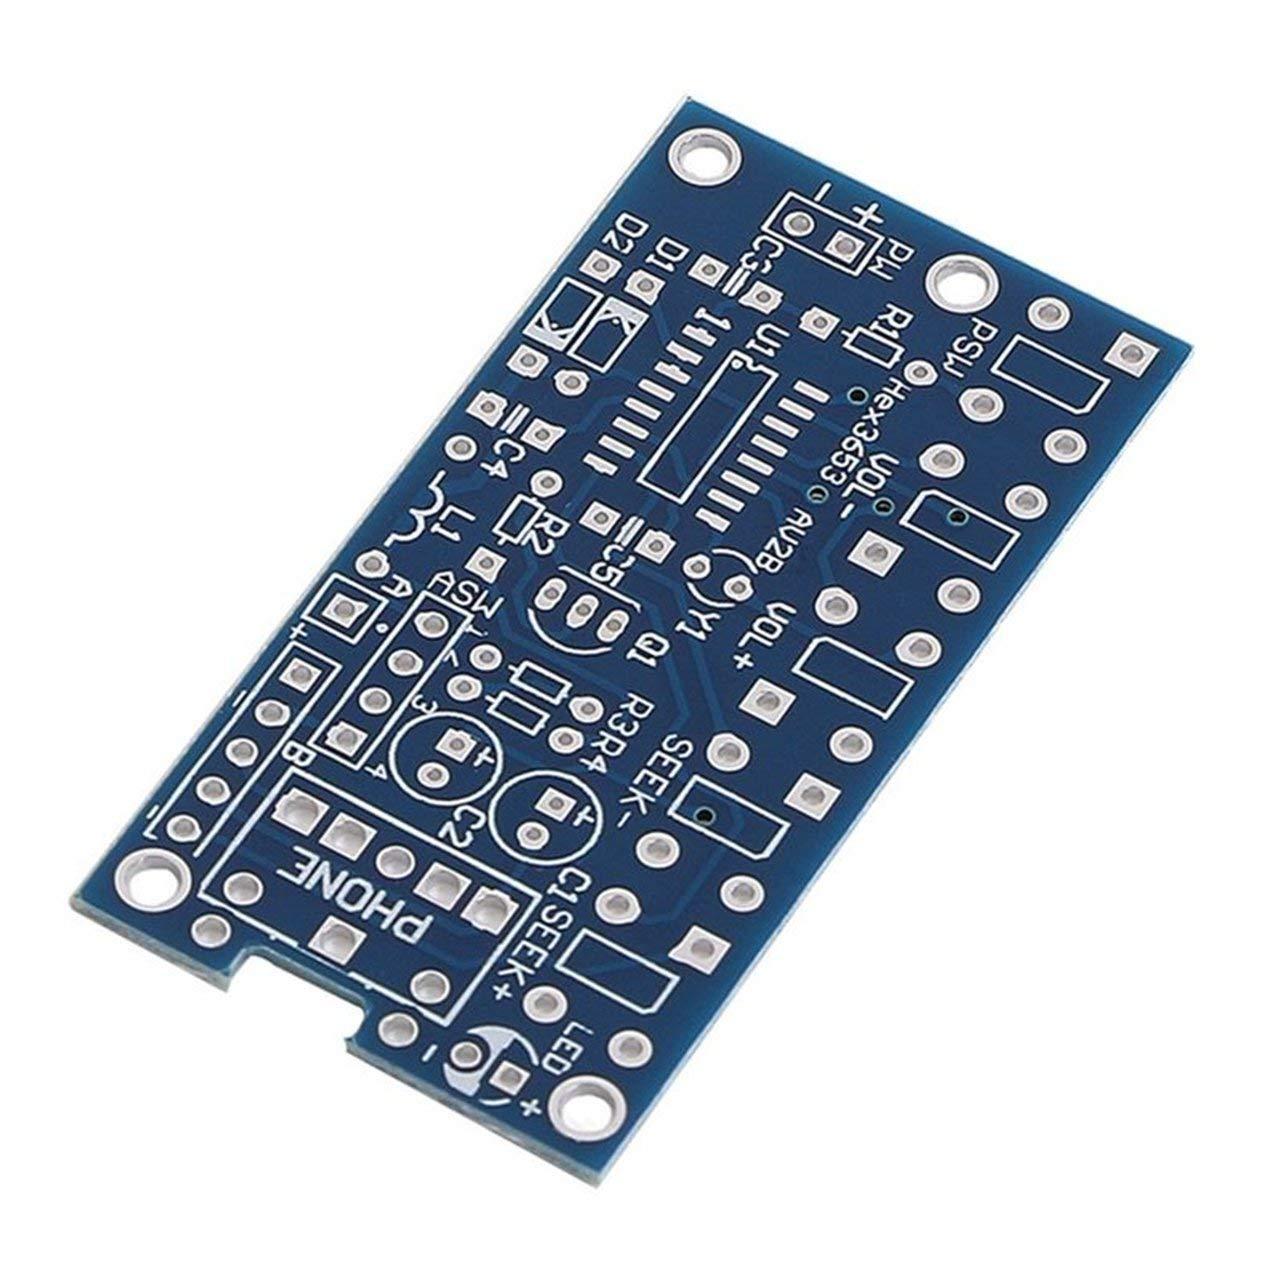 WOSOSYEYO Wireless Stereo FM Radio Receptor M/ódulo PCB Bricolaje electr/ónica Kits de 76MHz-108MHz Materiales ecol/ógicos